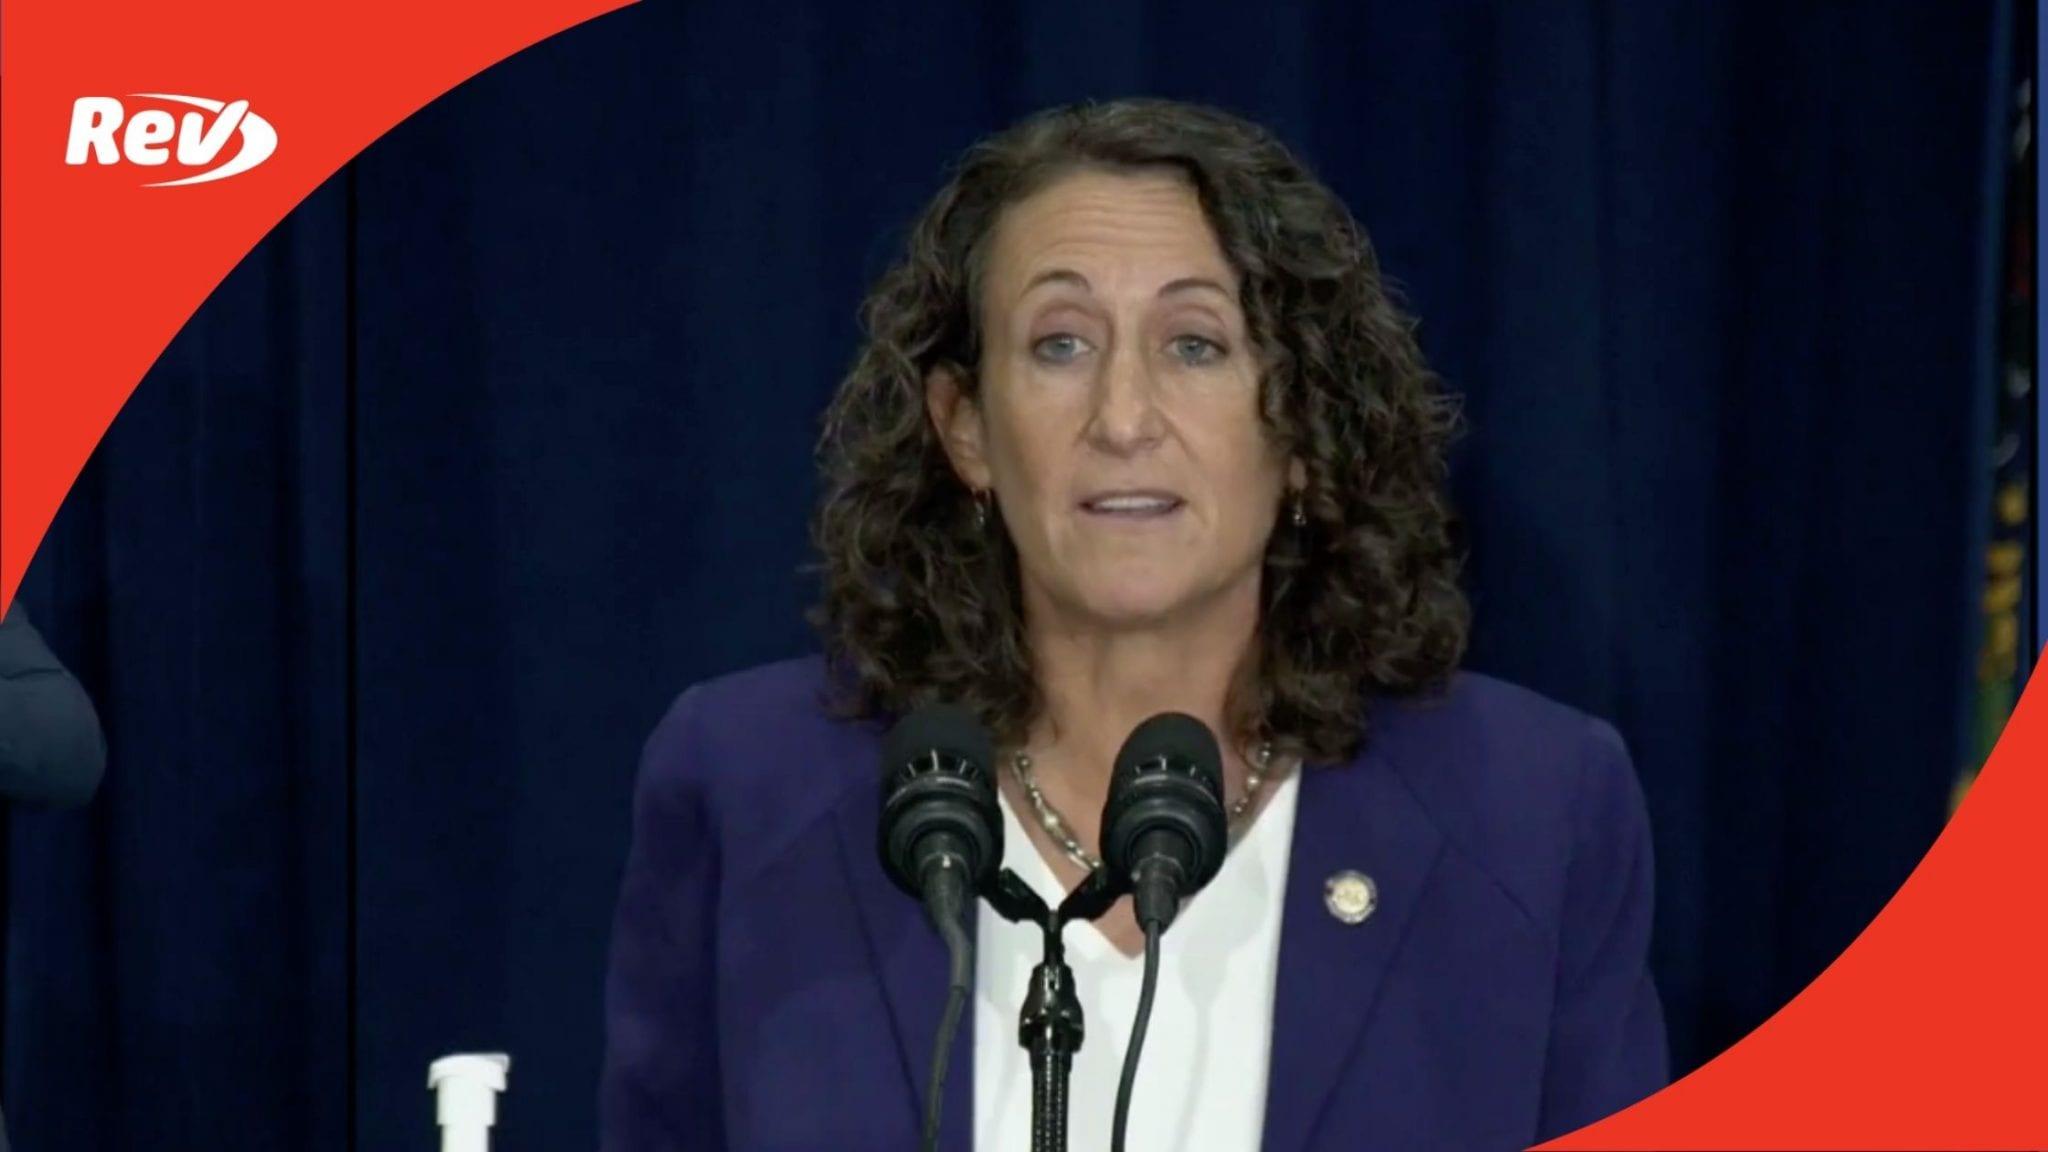 Pennsylvania Officials Press Conference on Election Vote Count Transcript November 5